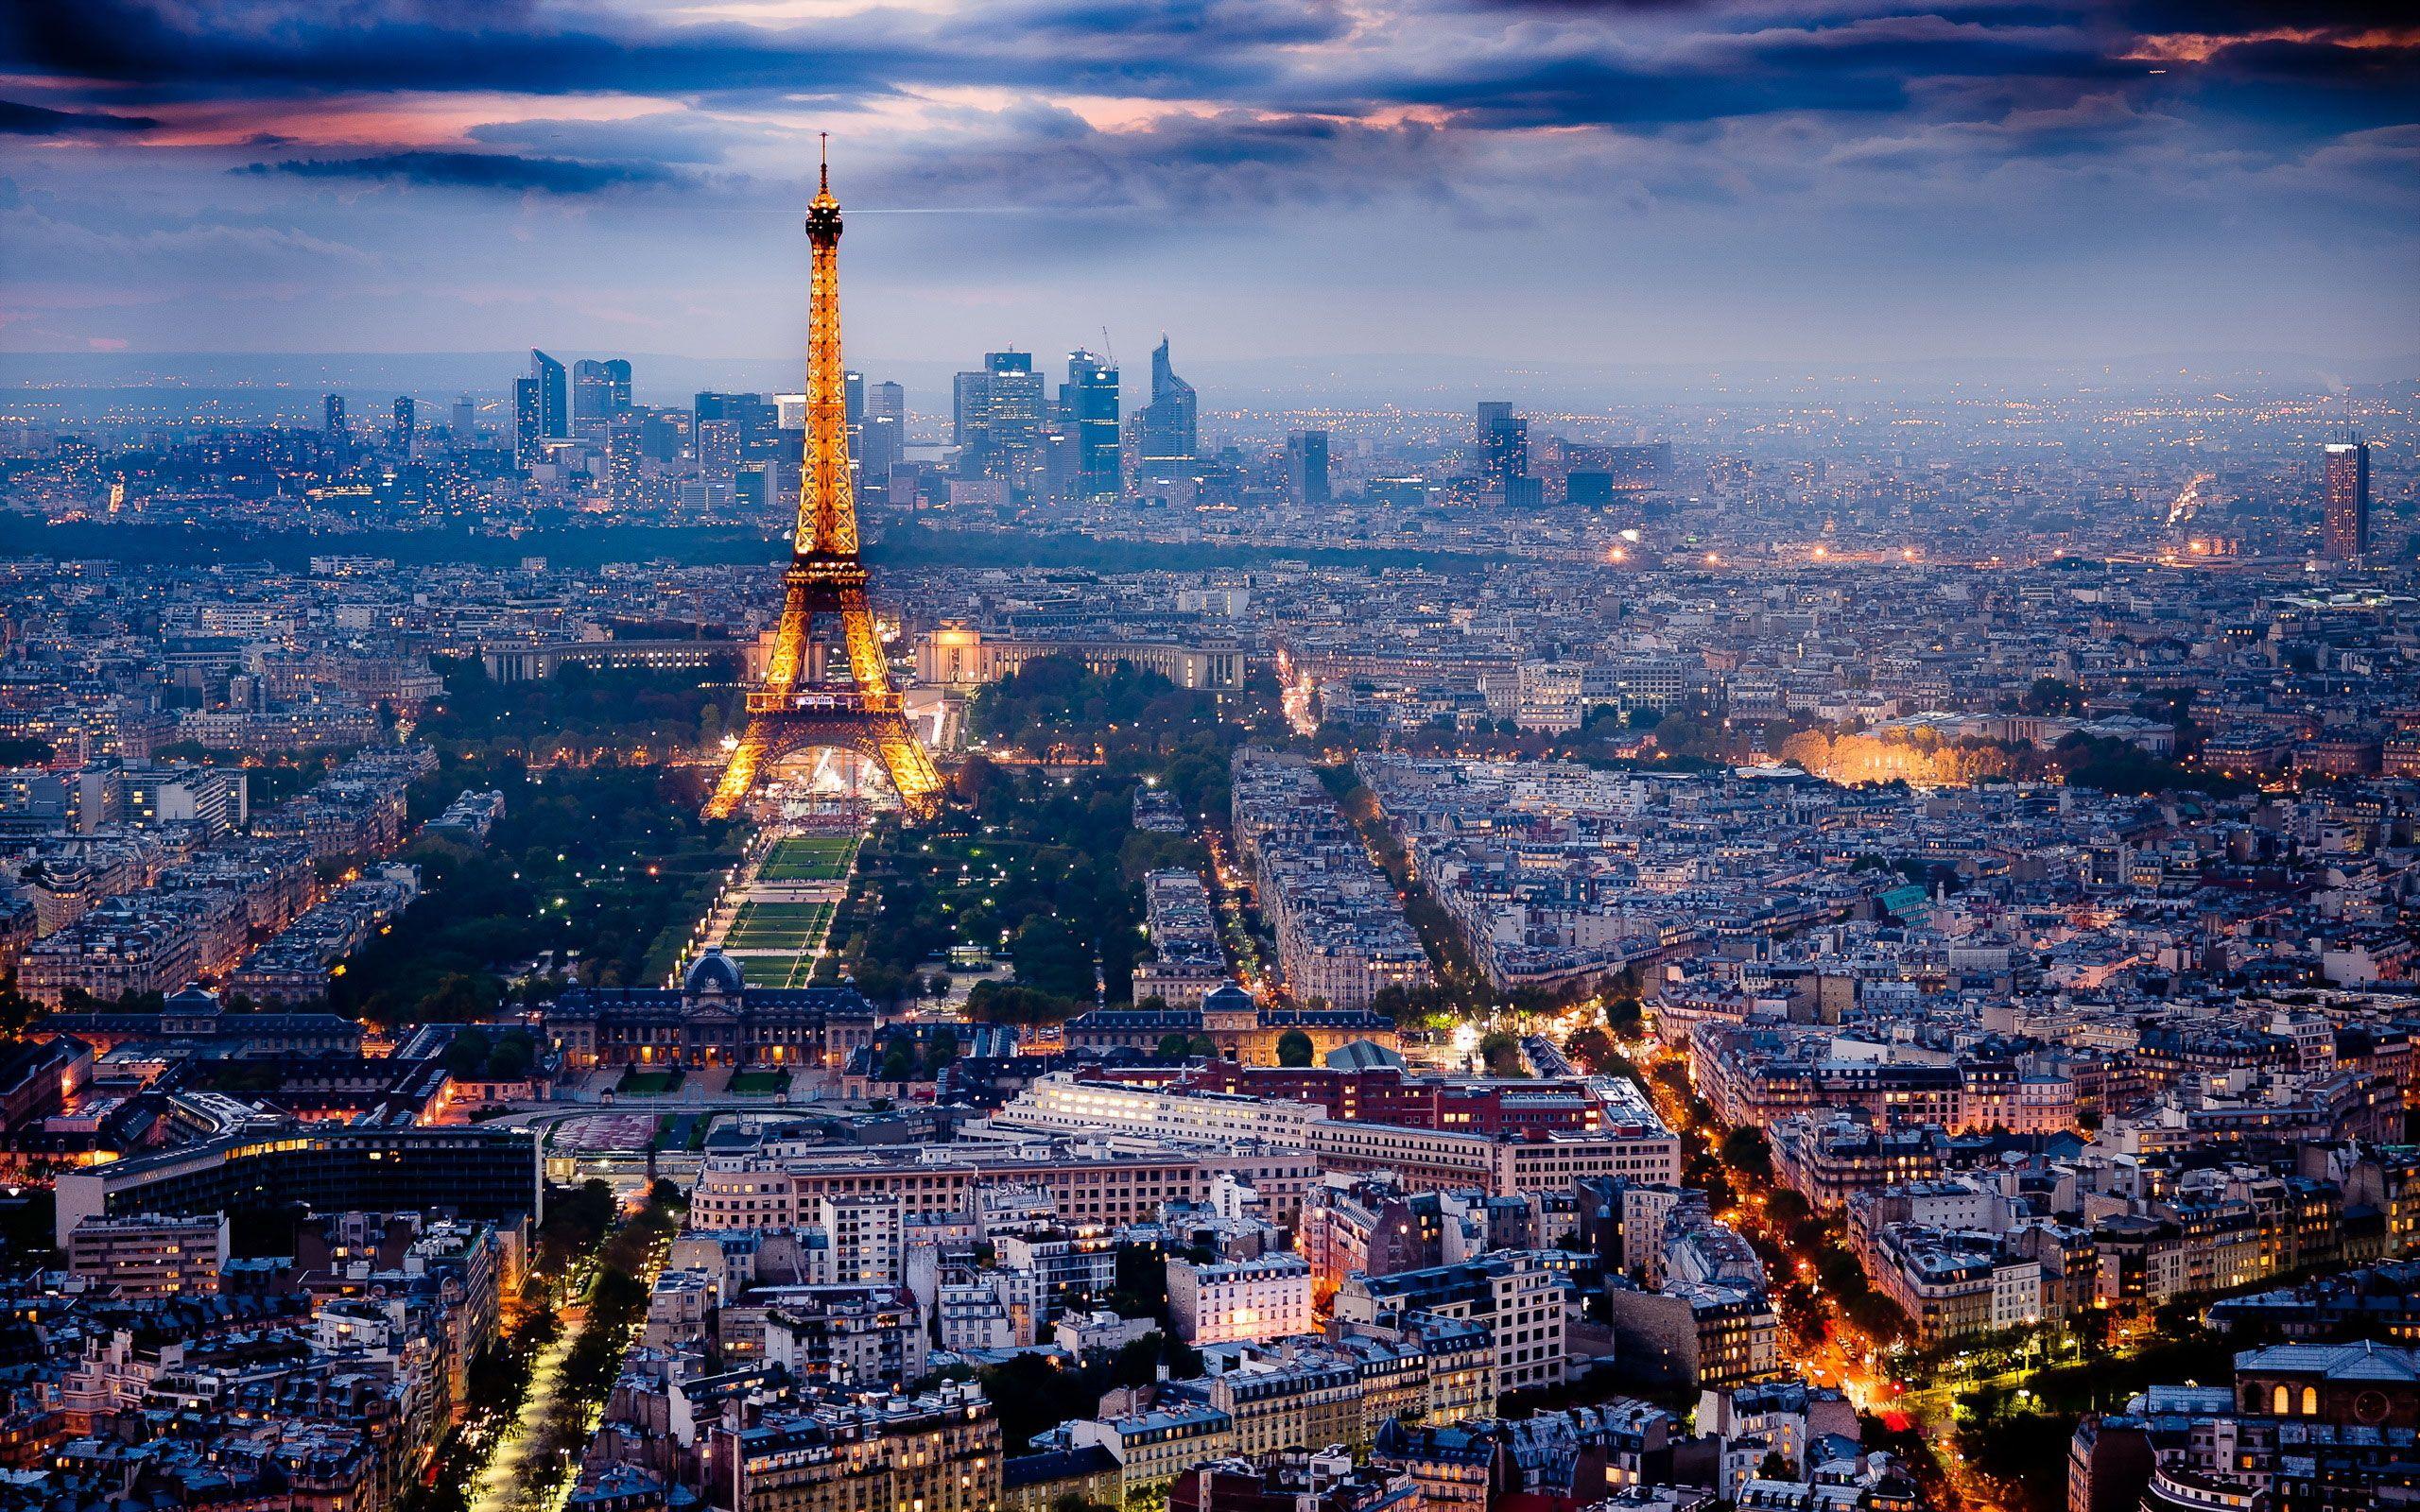 Landscape Paris Night View Hd Wallpaper Paris At Night Most Beautiful Cities Paris City